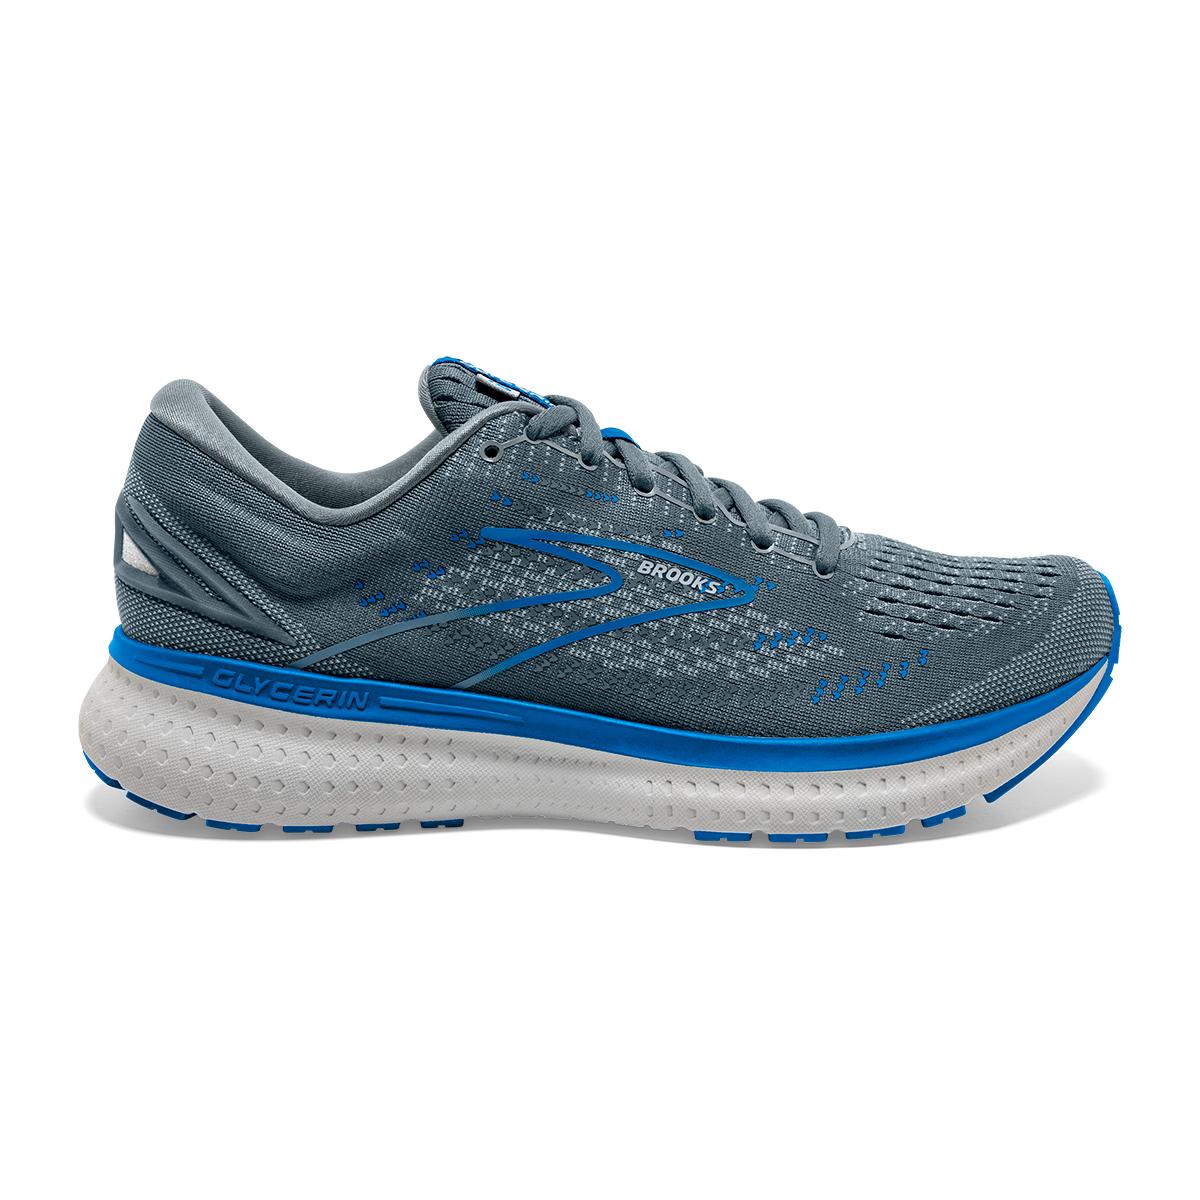 Men's Brooks Glycerin 19 Running Shoe - Color: Quarry/Grey/Dark - Size: 7 - Width: Regular, Quarry/Grey/Dark, large, image 1